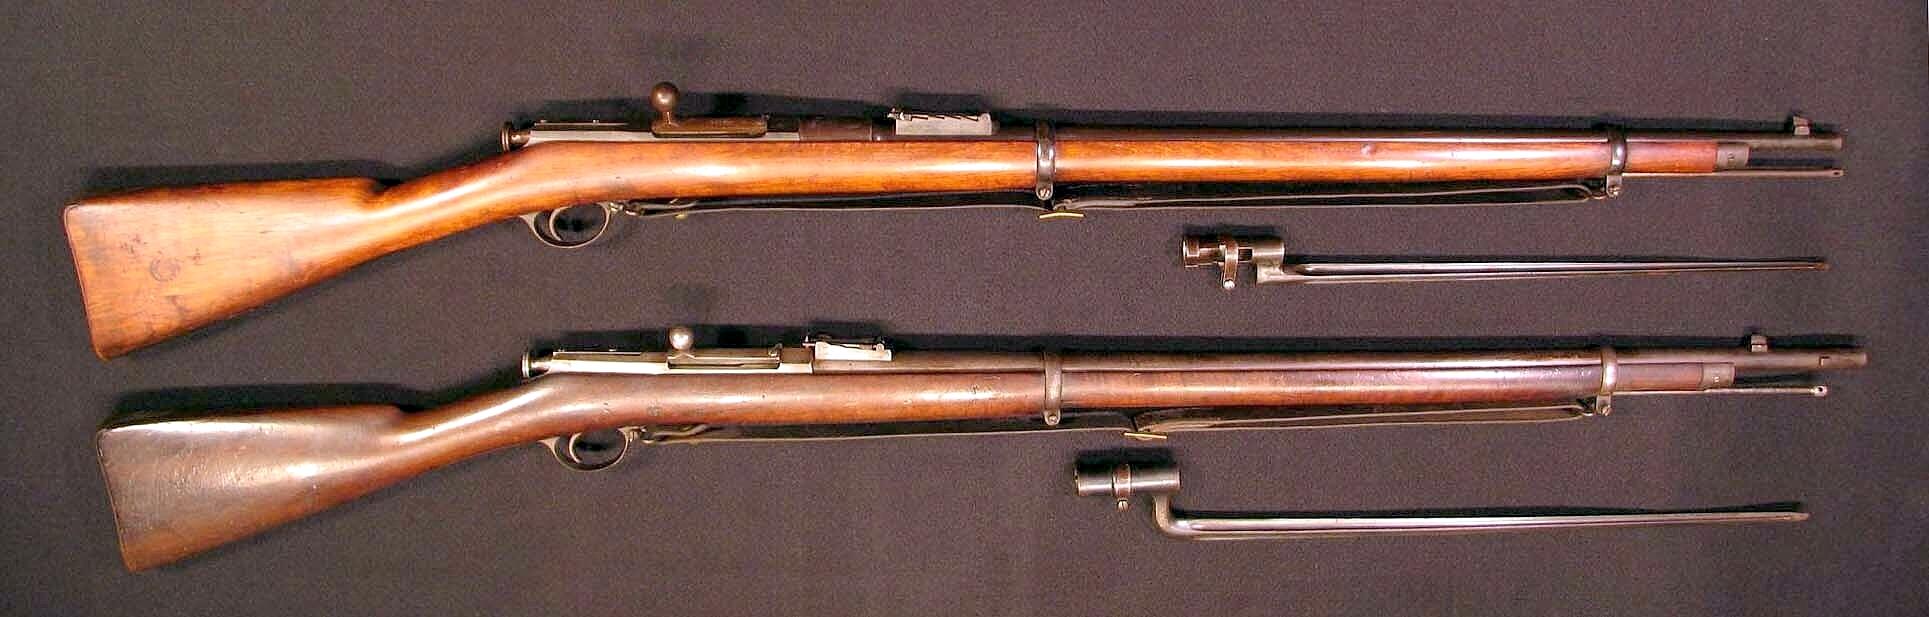 Click image for larger version.  Name:Berdan Three-Line Rifle top & Berdan II 7AR.jpg Views:5 Size:735.5 KB ID:2309586